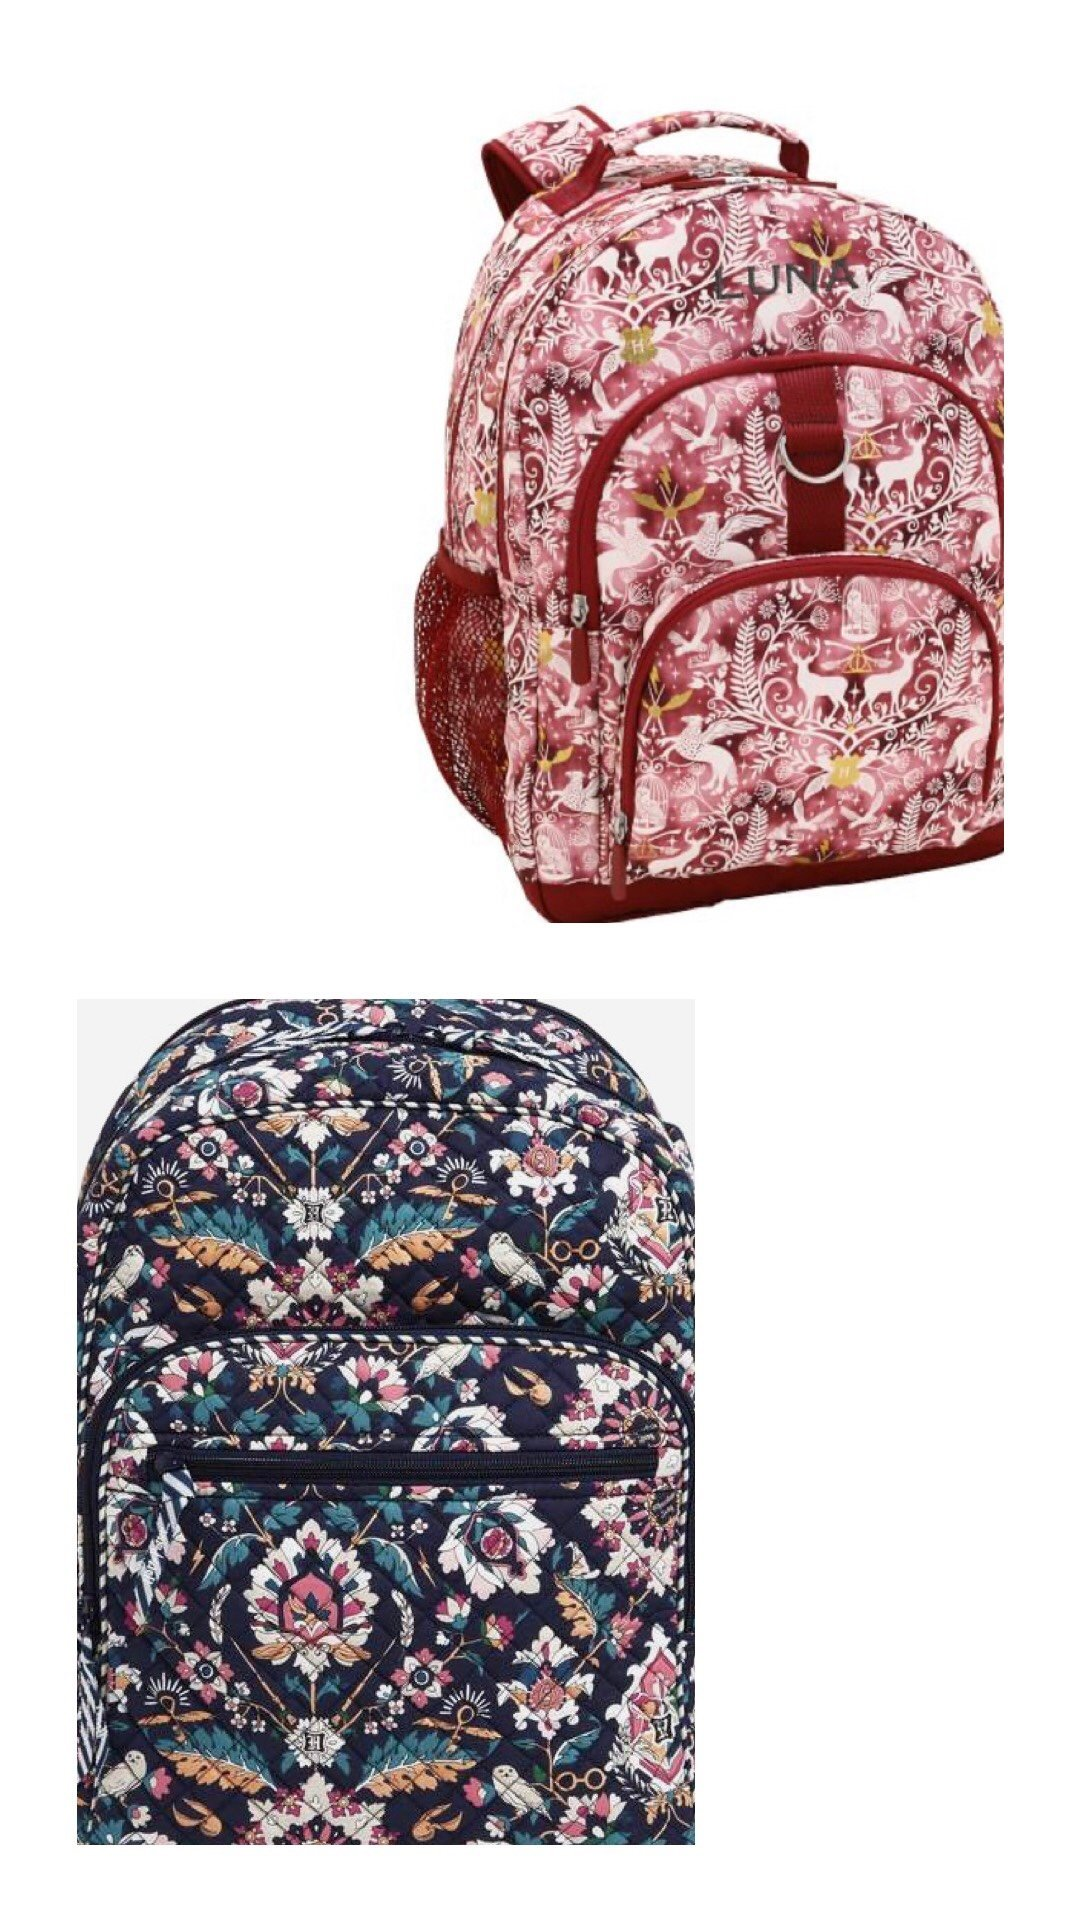 Harry Potter backpack, harry potter magical weekender bag, harry potter bag, harry poter trip